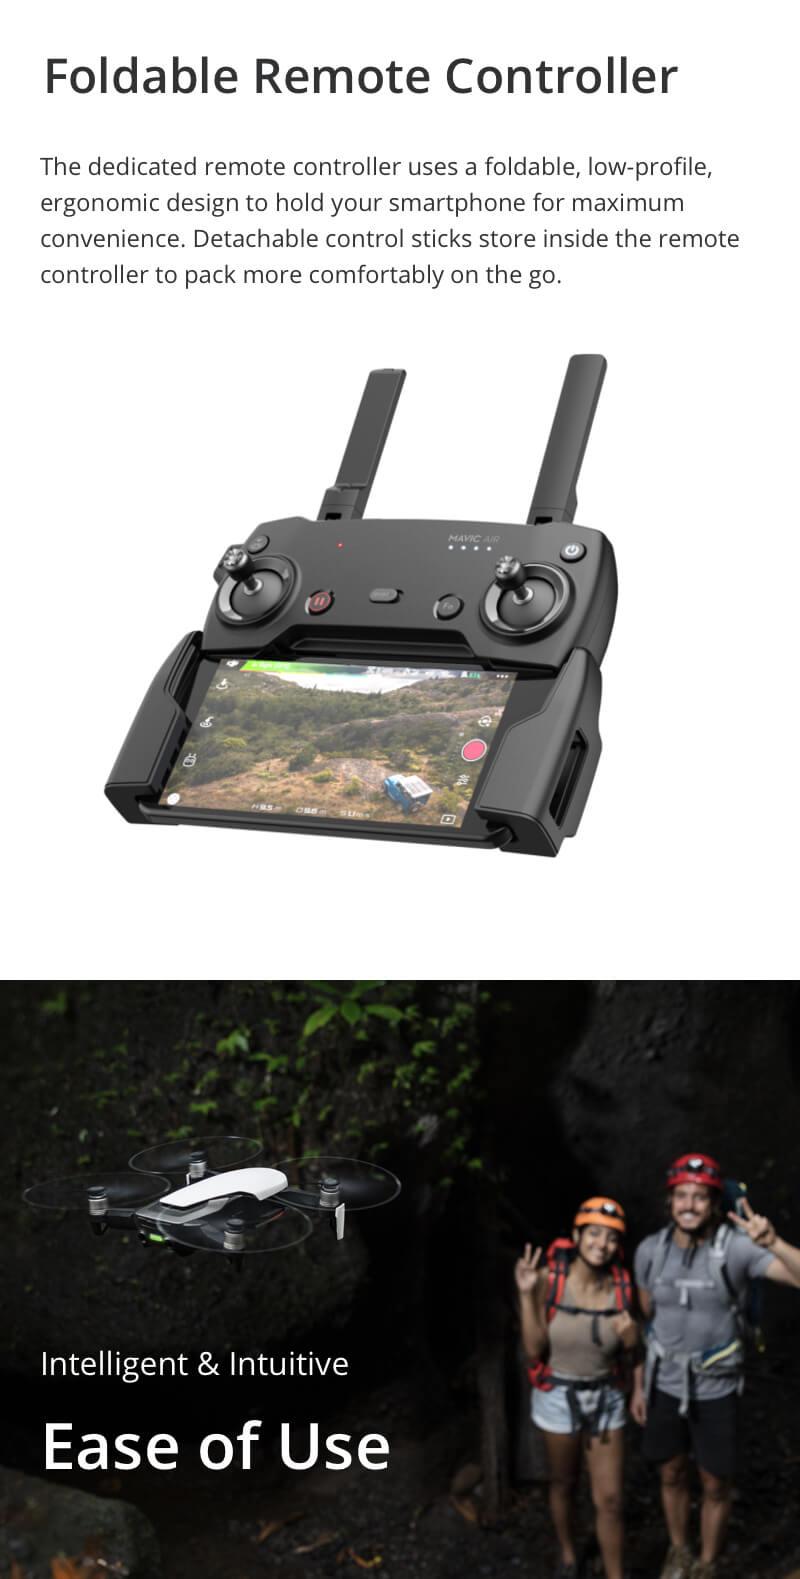 DJI Mavic Air 4KM FPV w/ 3-Axis Gimbal 4K Camera 32MP Sphere Panoramas RC Drone Quadcopter - Photo: 7